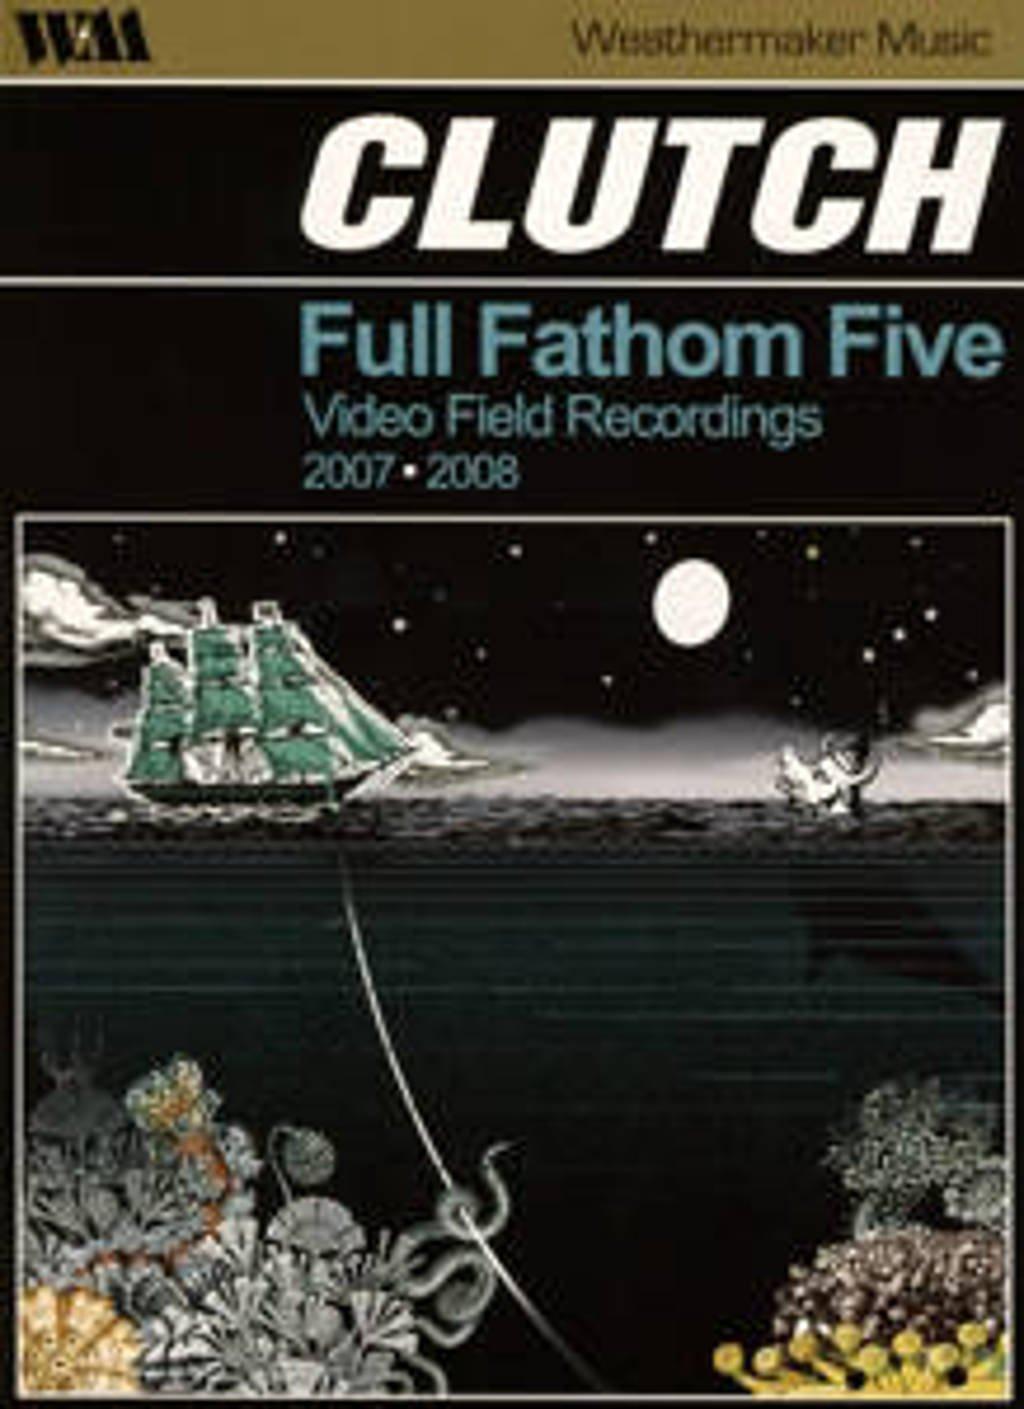 Clutch - Full Fathom Five Video Field Record (DVD)